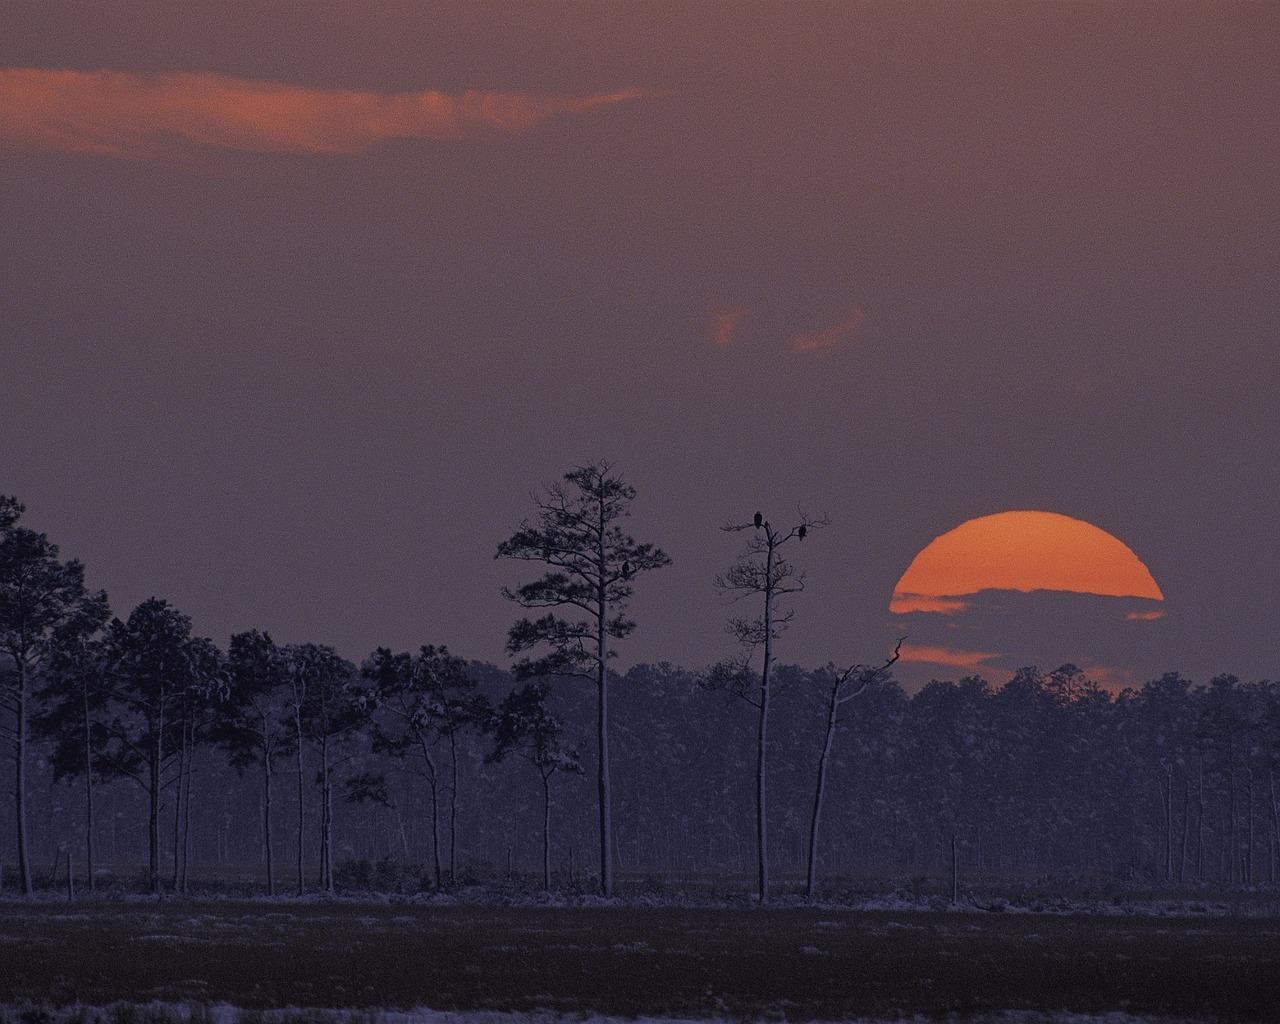 sunset-942080_1280